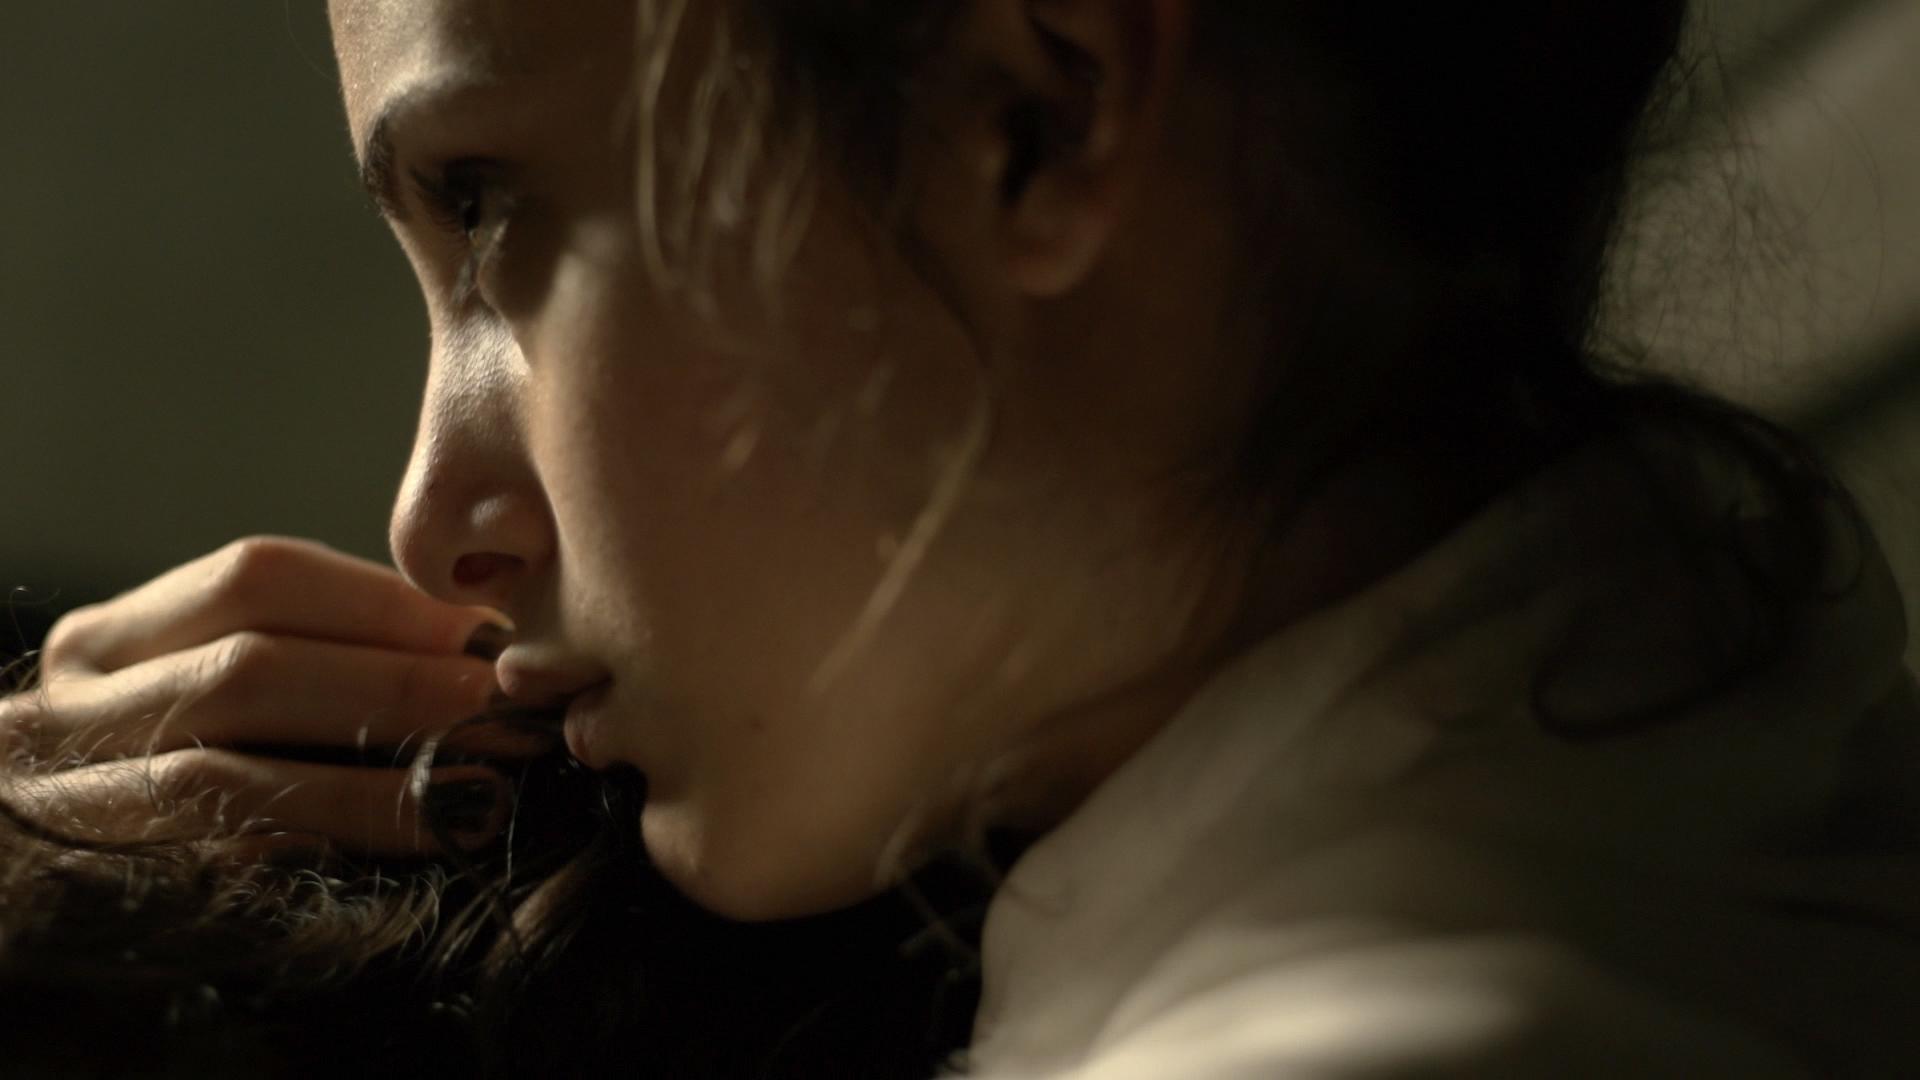 DIAMOND ON VINYL - Co-Producer (2012)Official Selection to the Slamdance & Downtown film festivals, writer/director J.R. Hughto